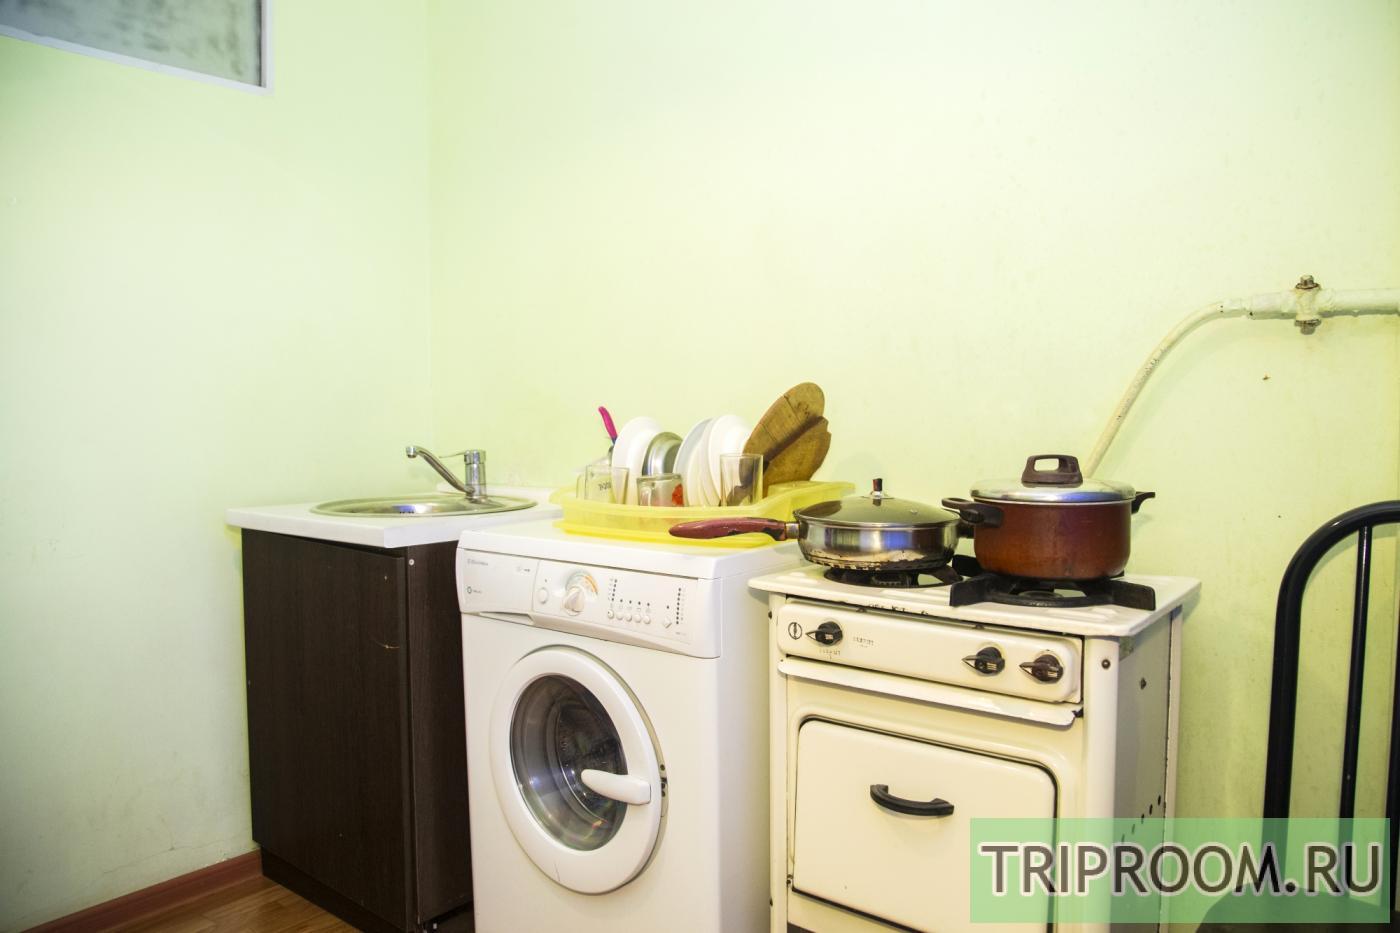 1-комнатная квартира посуточно (вариант № 6615), ул. Александра Матросова улица, фото № 5